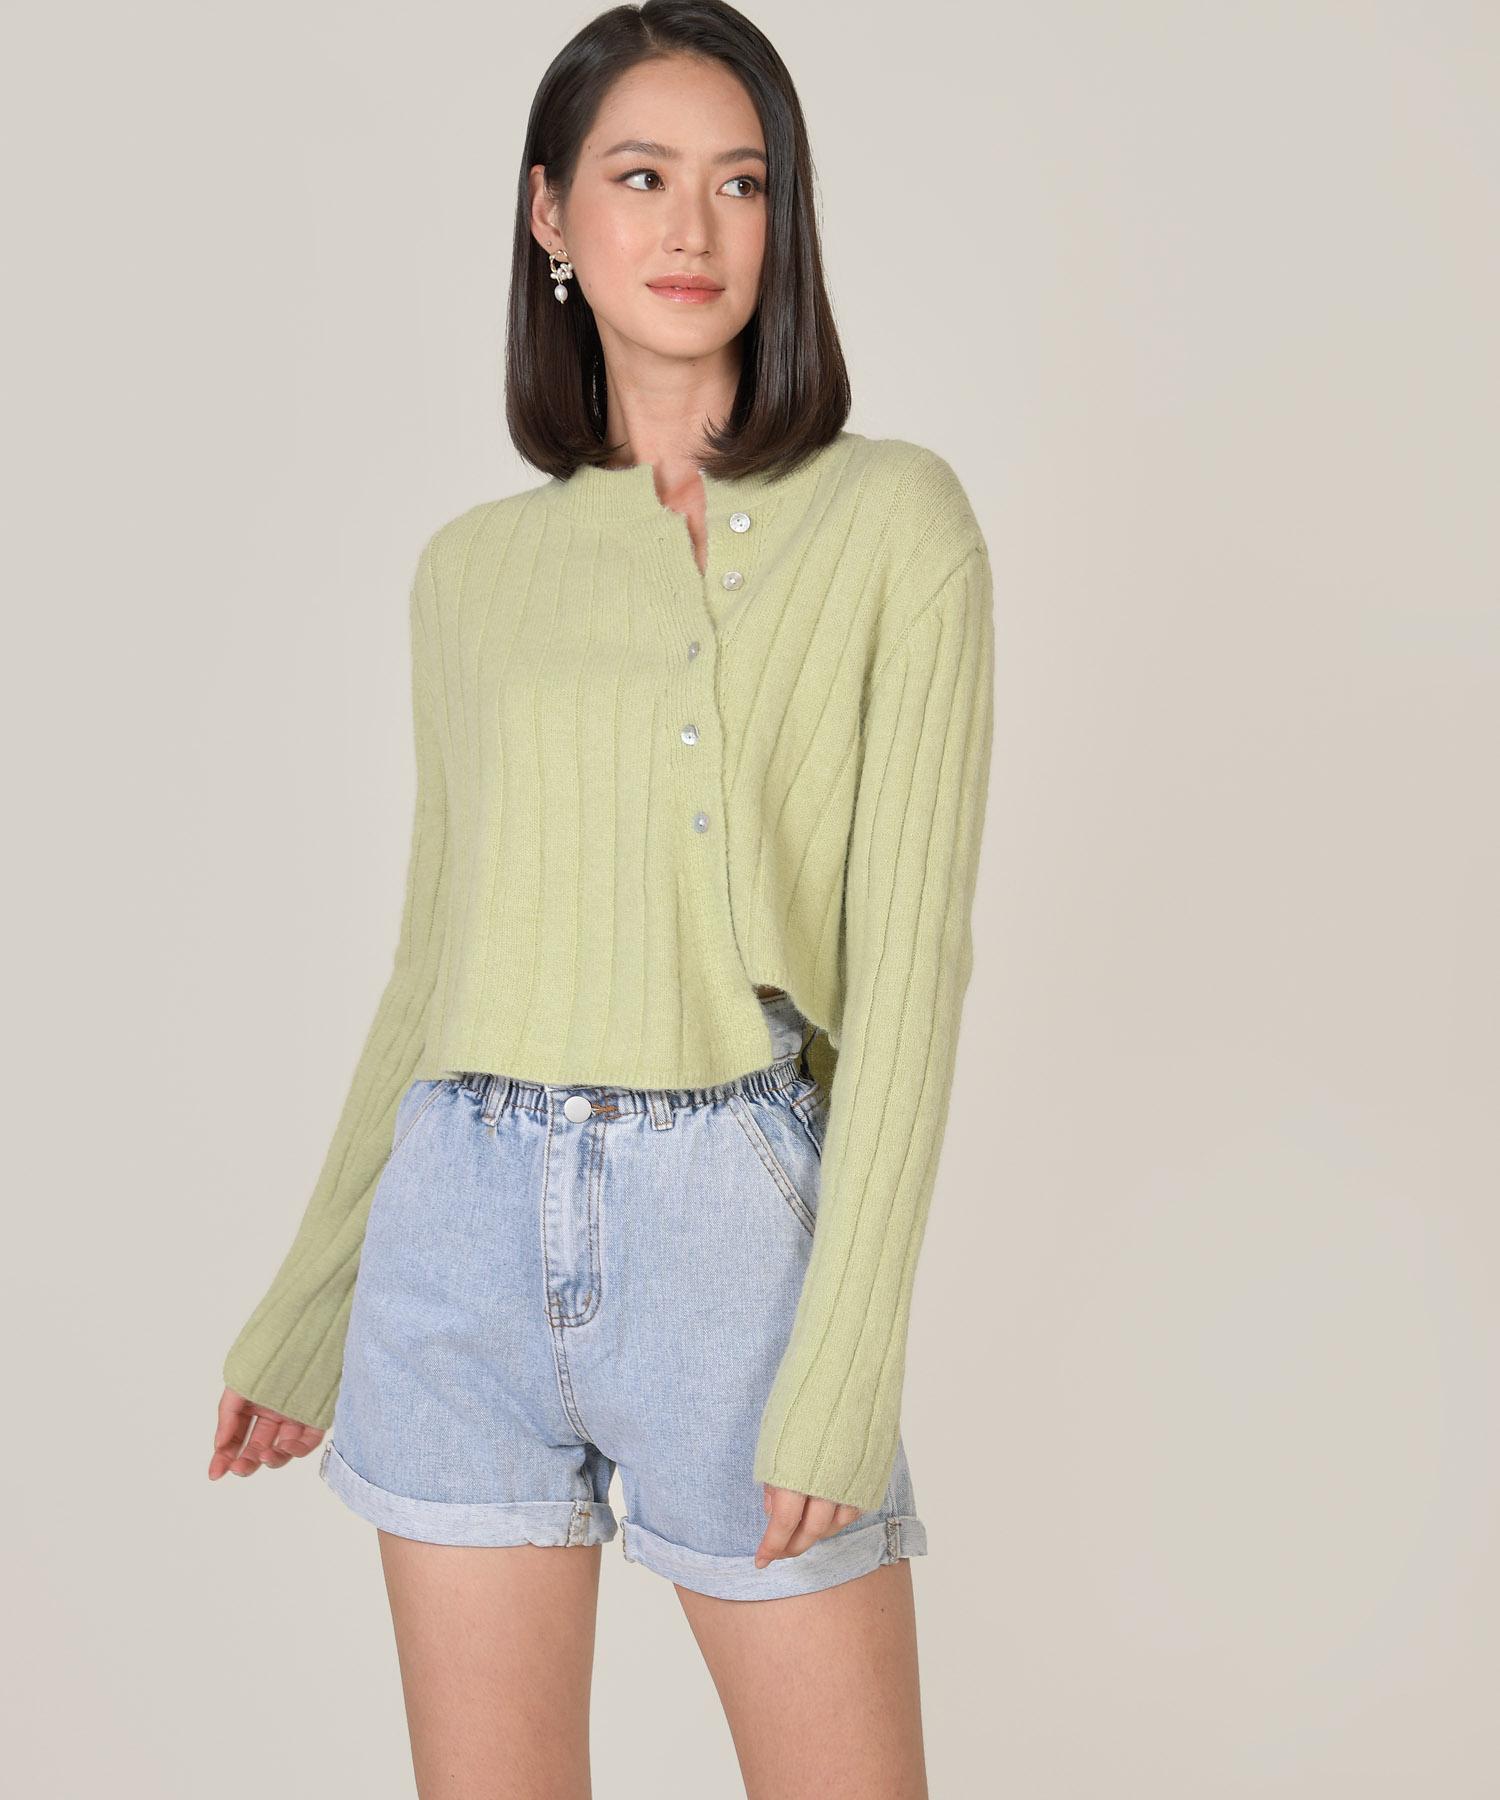 paulin-asymmetric-knit-sweater-green-tea-2